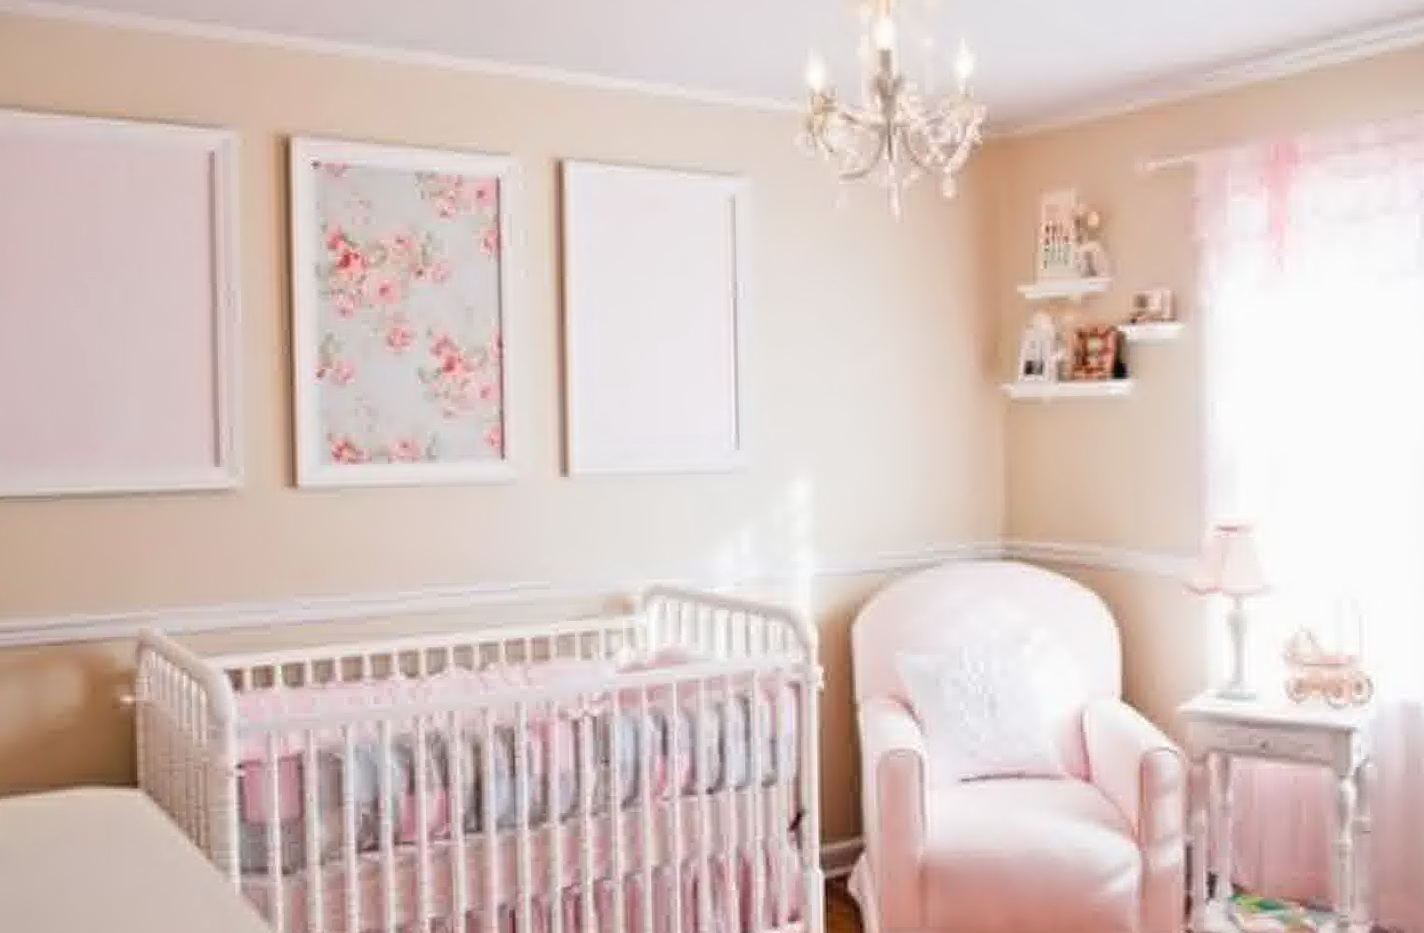 Diy Baby Wall Art